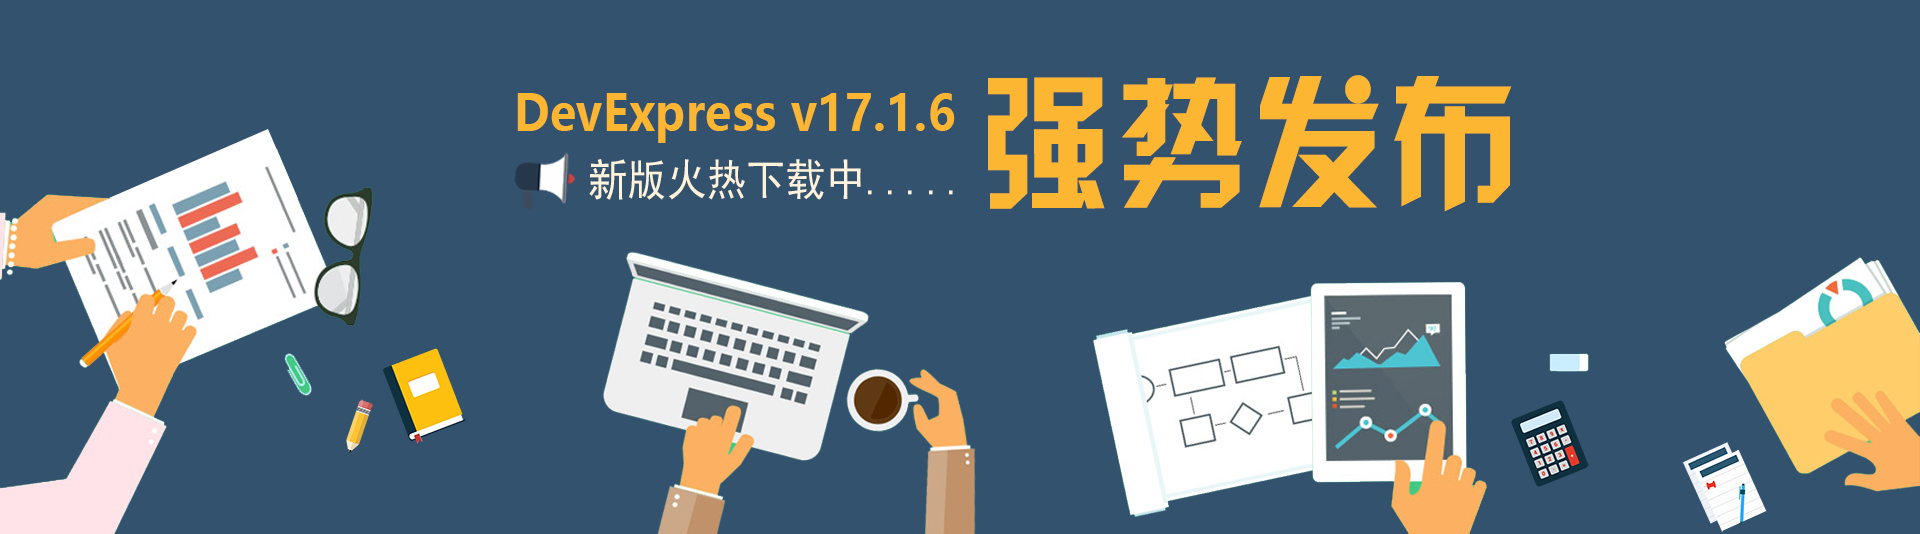 DevExpress v17.1.6全新发布